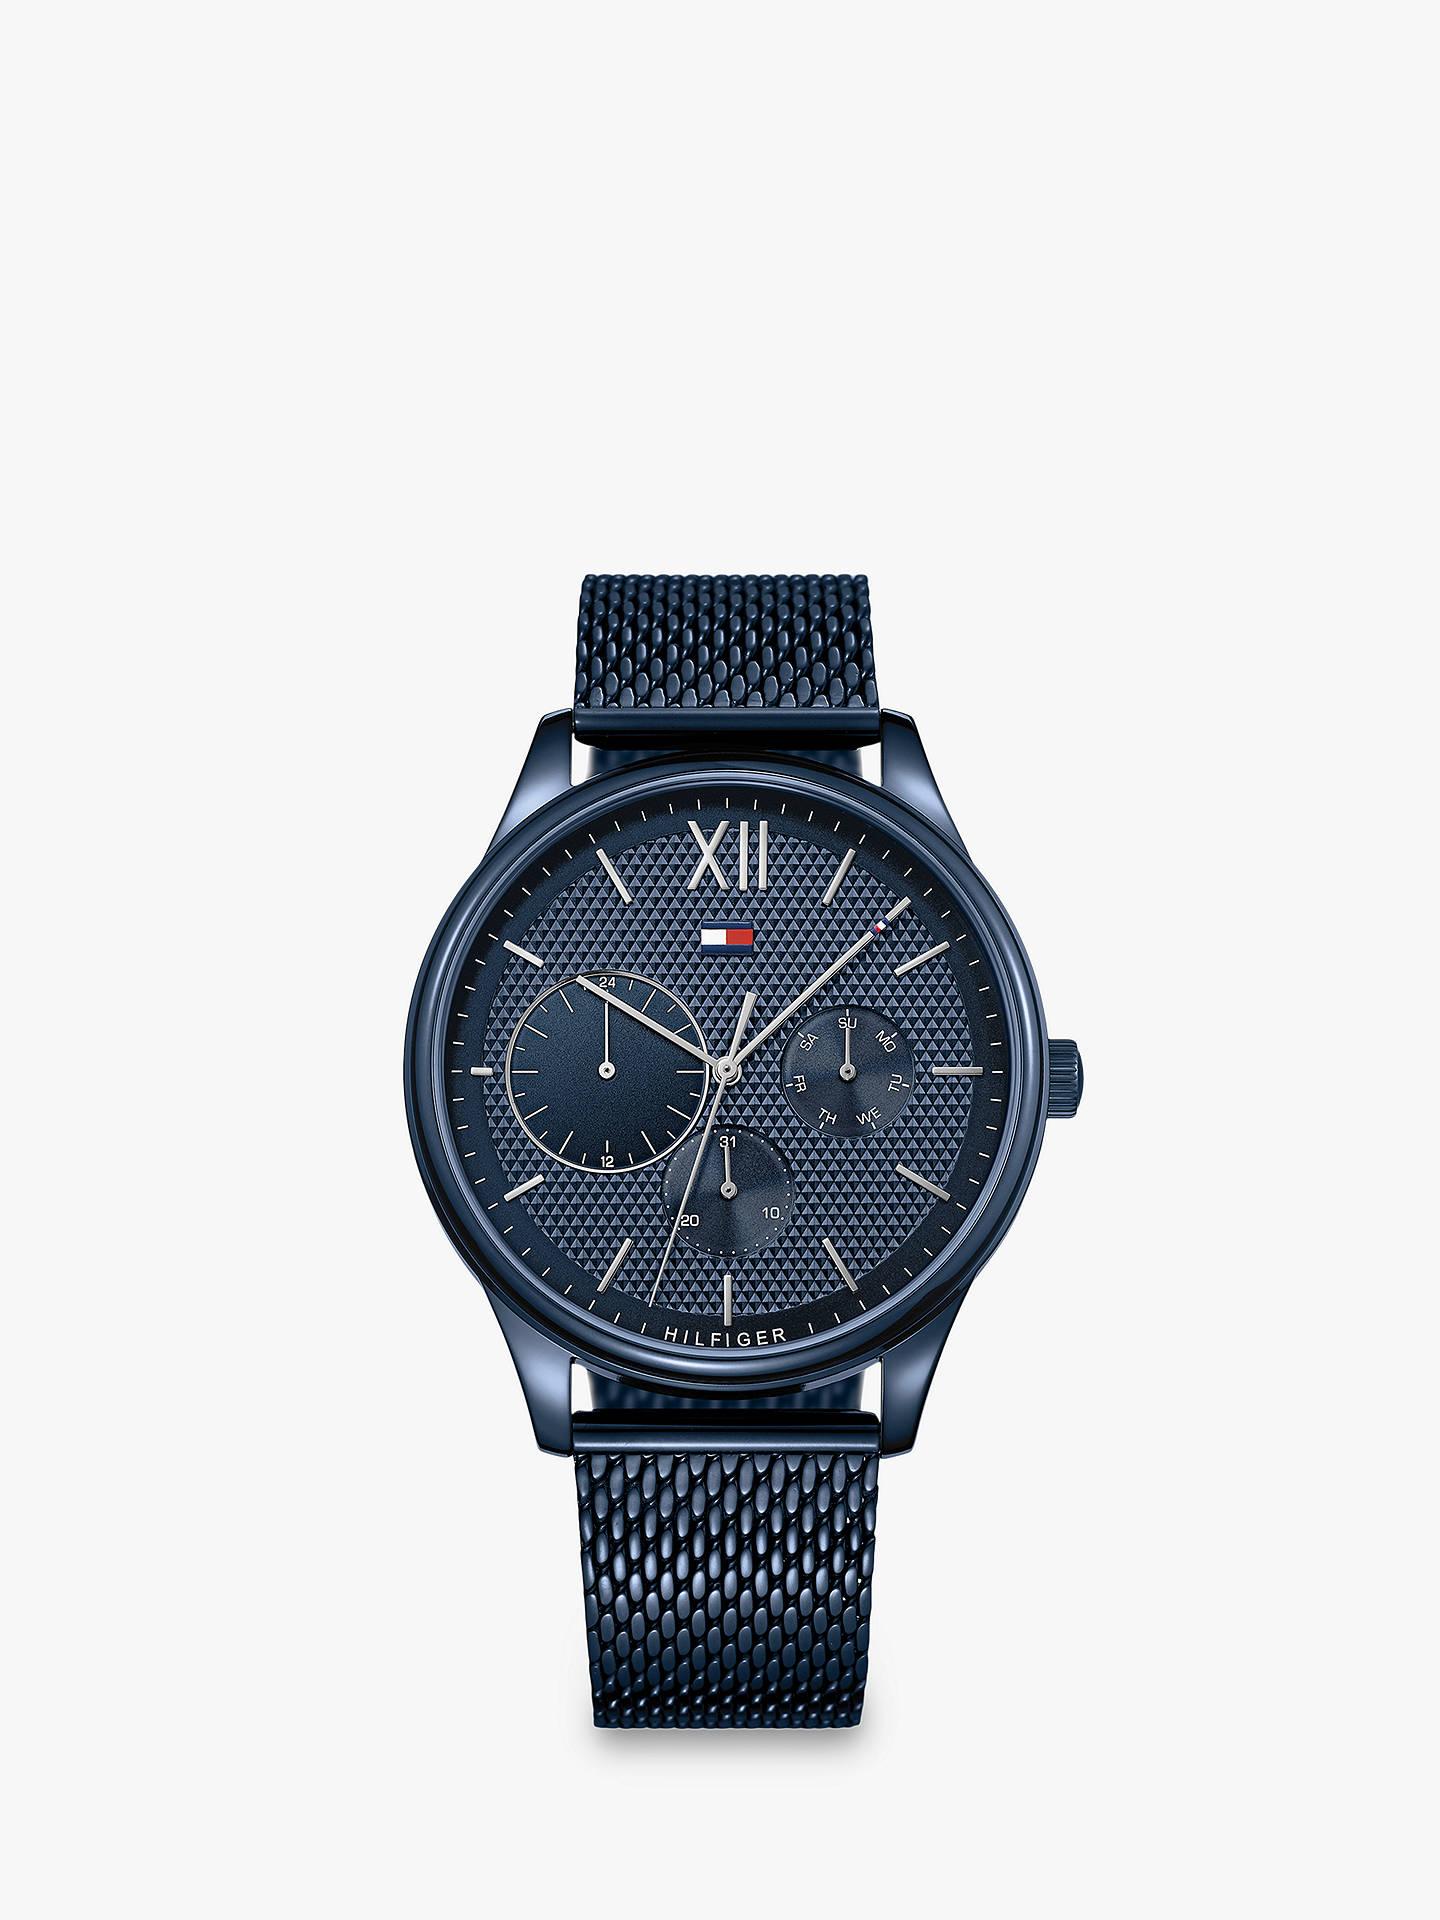 BuyTommy Hilfiger Men s Damon Single Chronograph Day Mesh Bracelet Strap  Watch, Blue 1791421 Online at a92c4c15ba